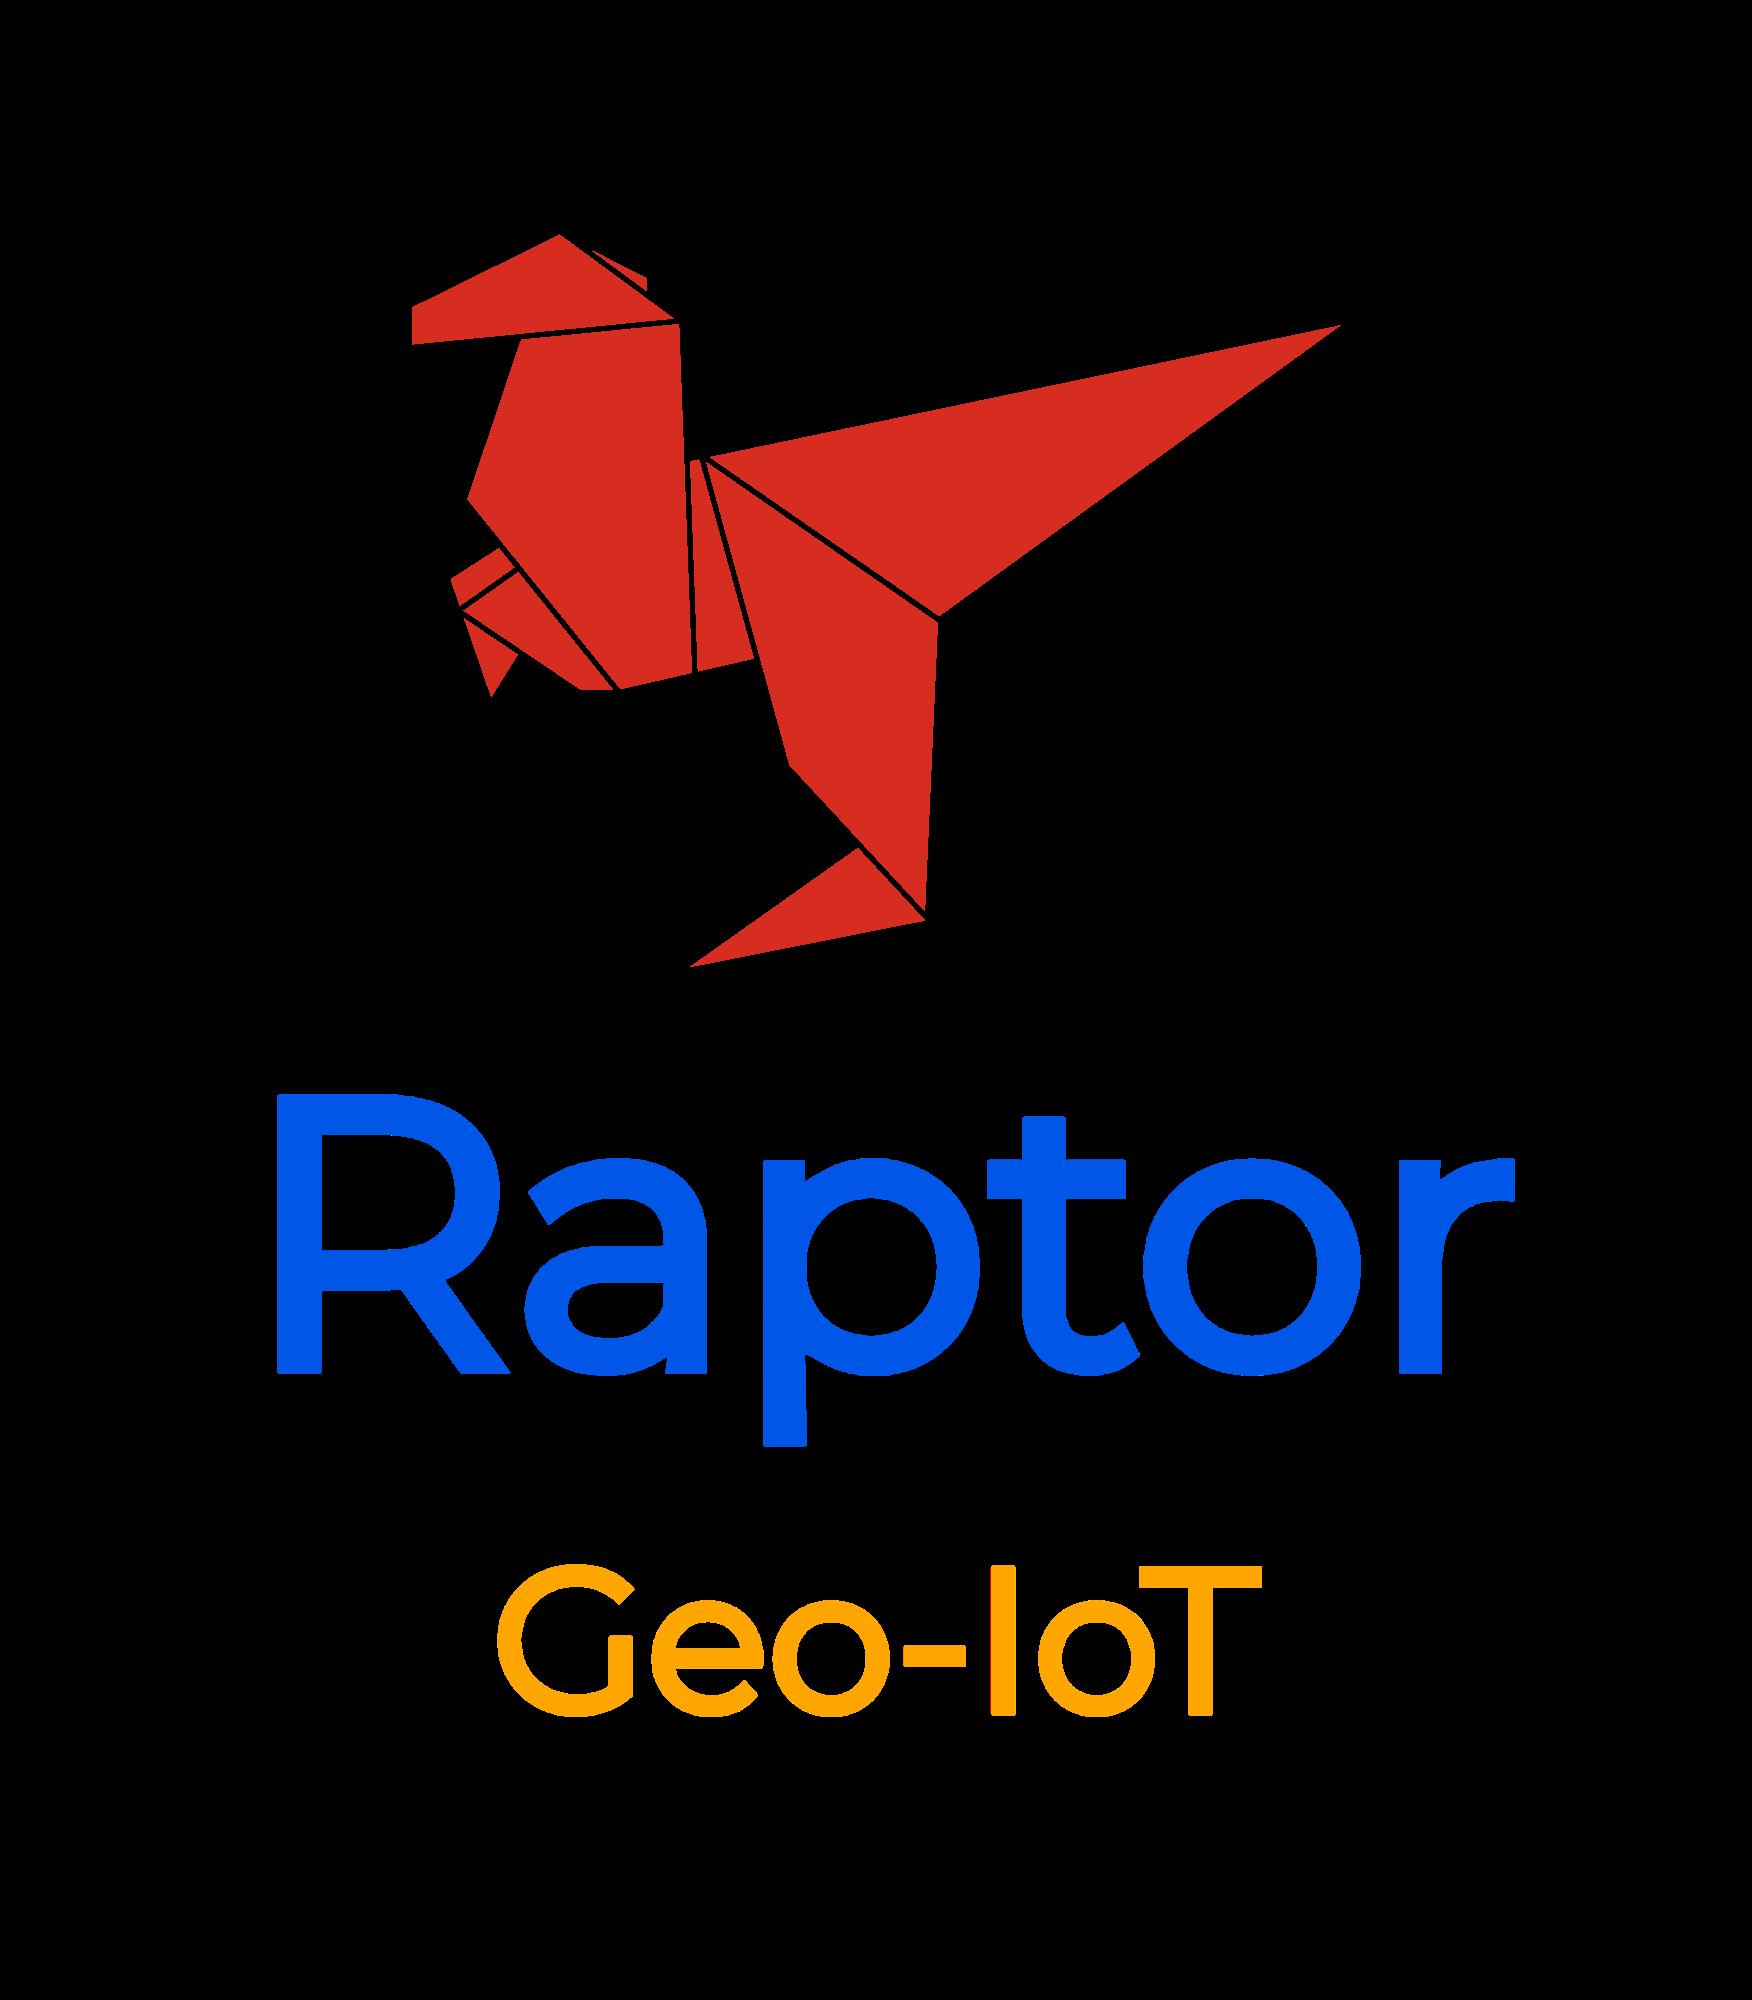 Copy of Raptor-logo1.png